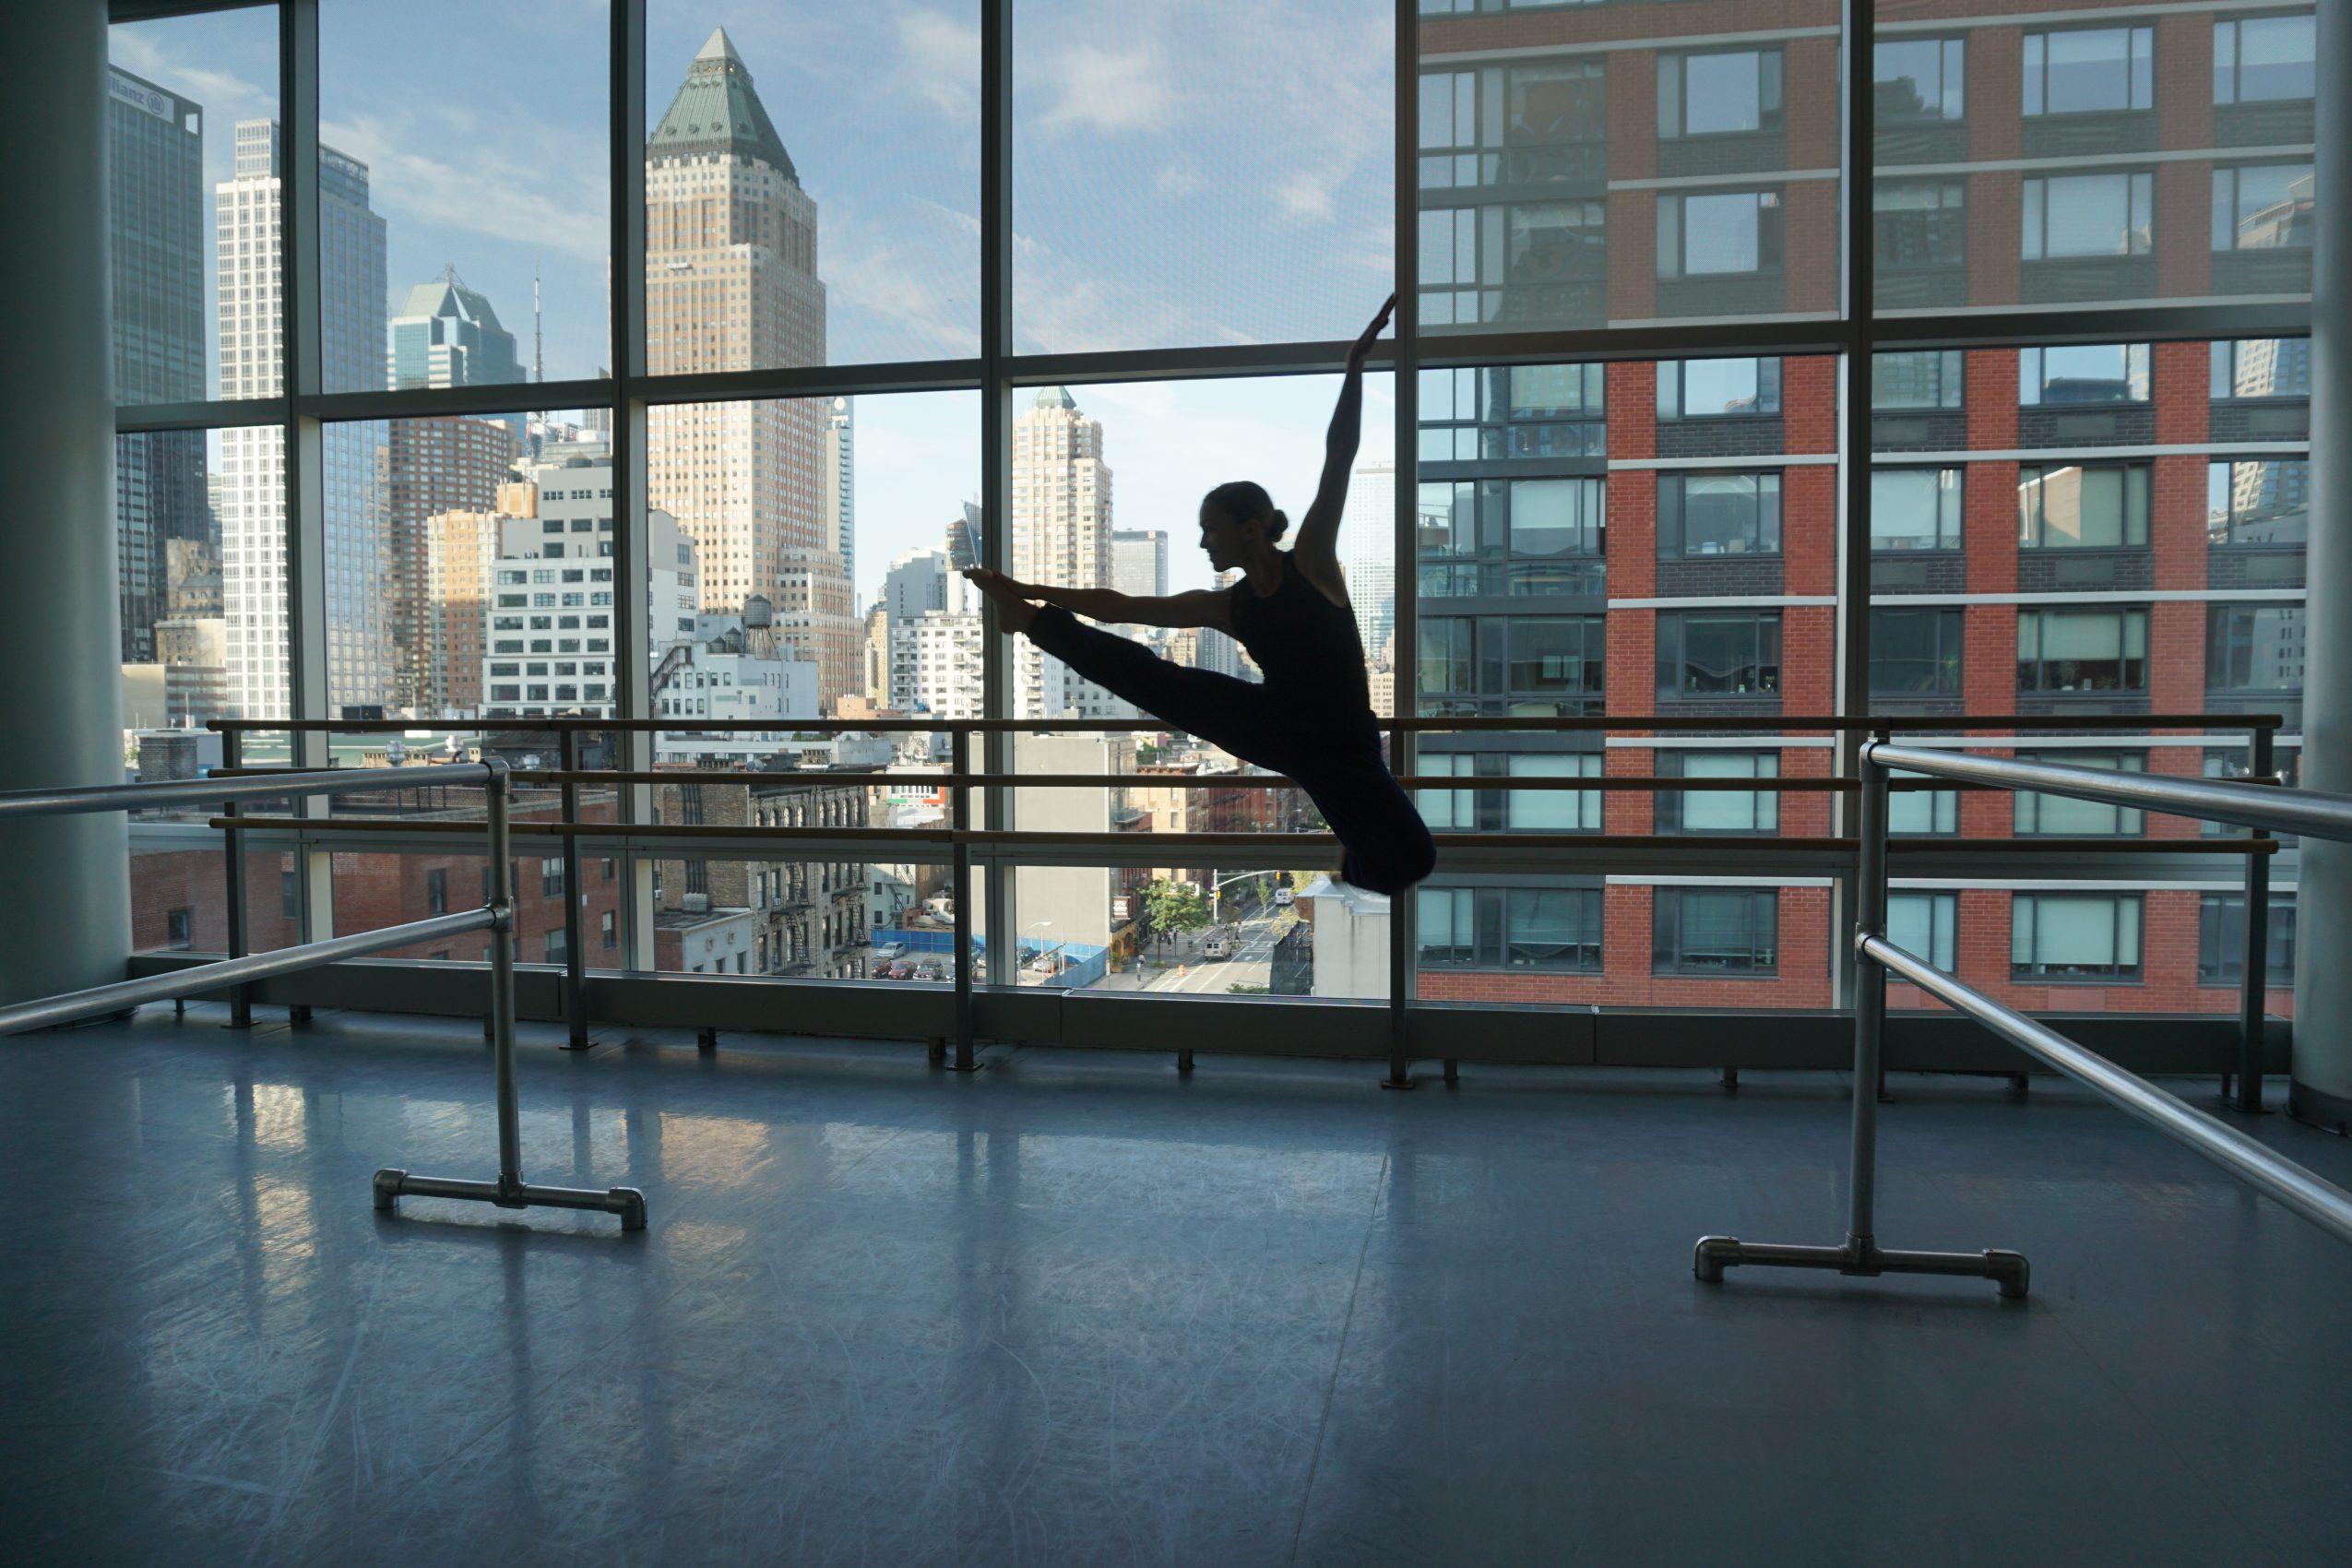 Elise @ Alvin Ailey School NYC